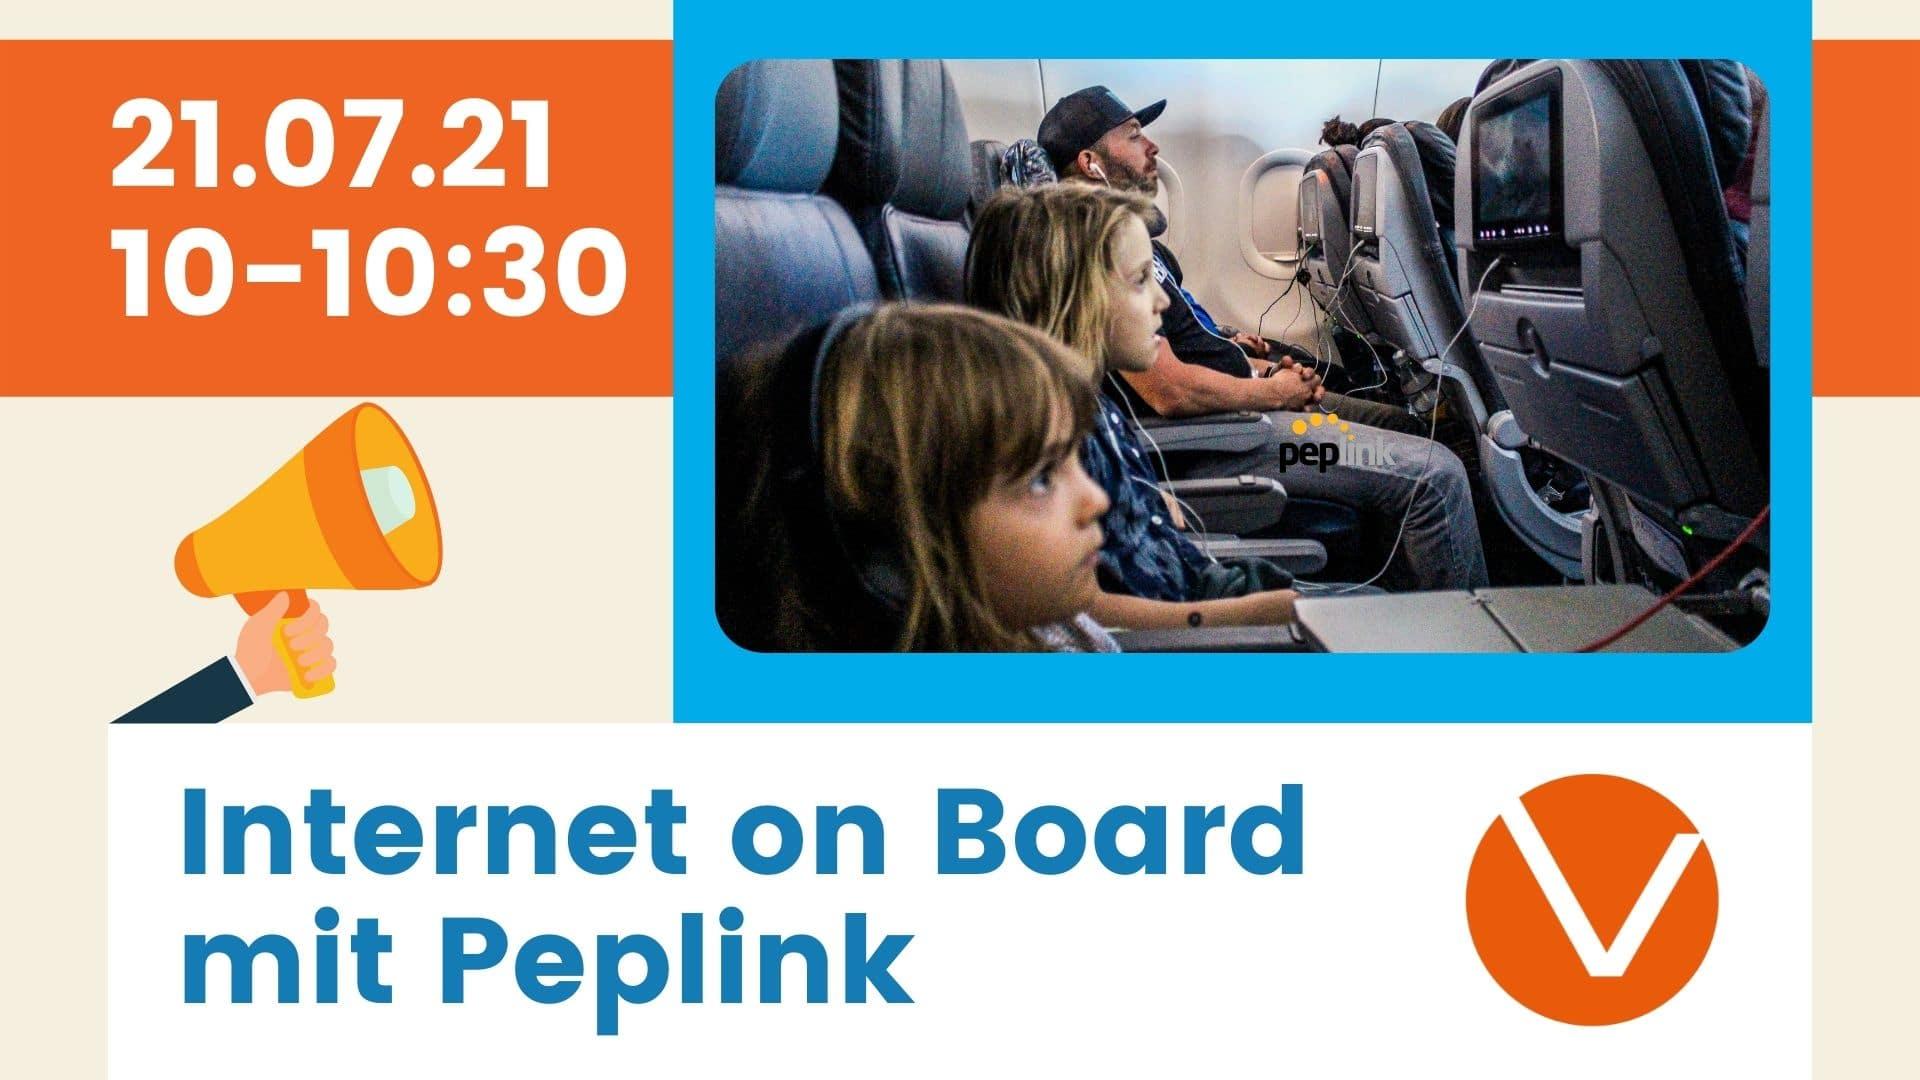 Internet on Board mit Peplink - Webinar - 21.07.2021 10-10:30 Uhr